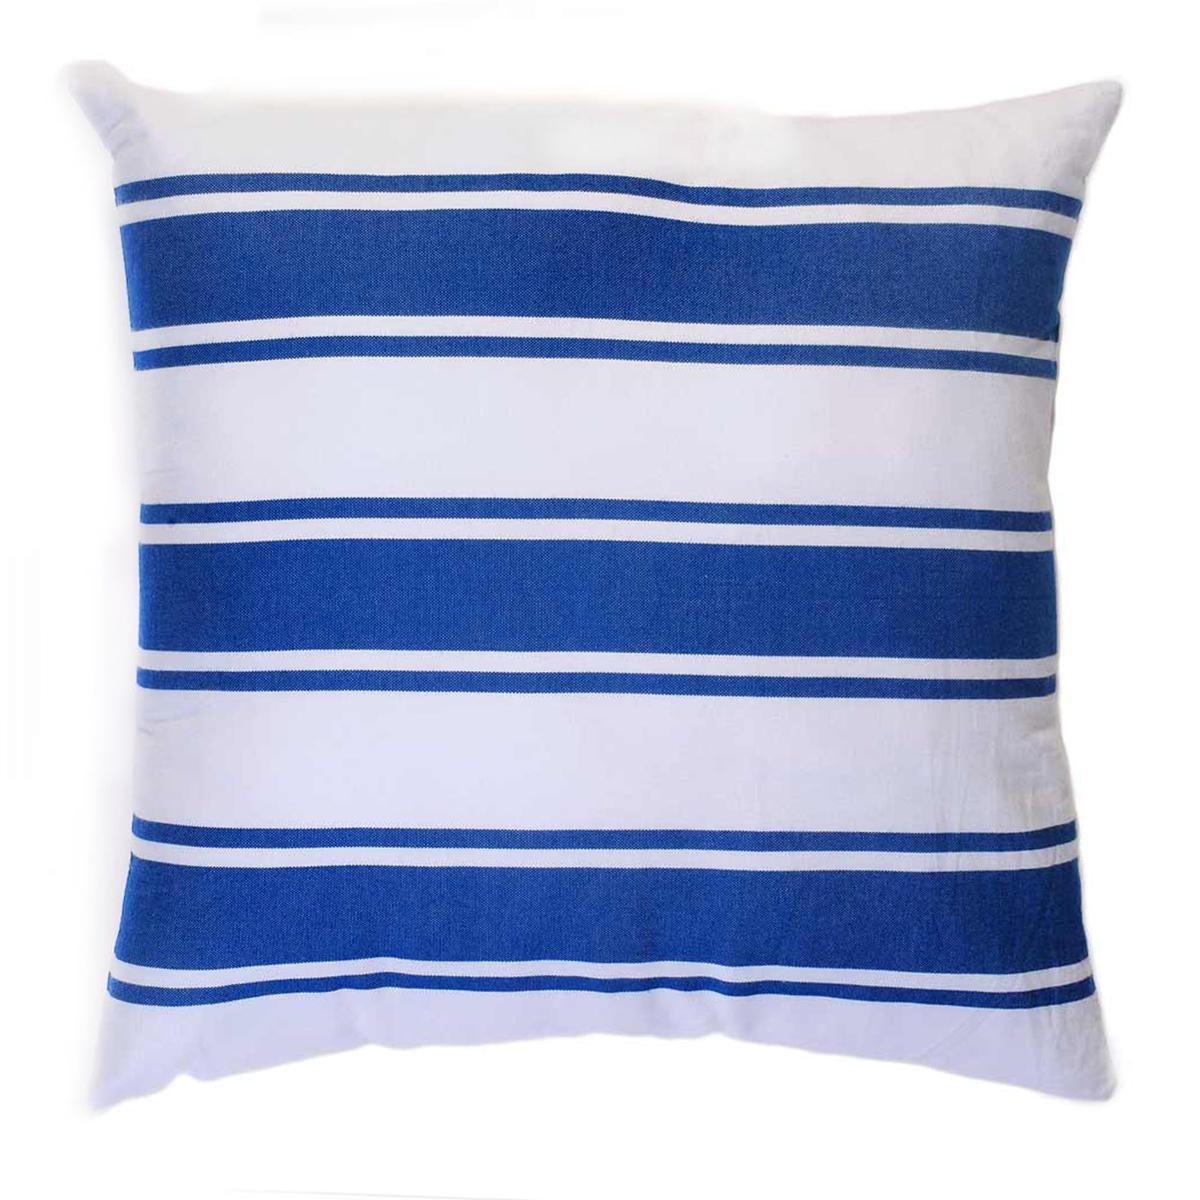 CASABLANCA - Taie d'oreiller coton rayures bleu fond blanc 60 x 60